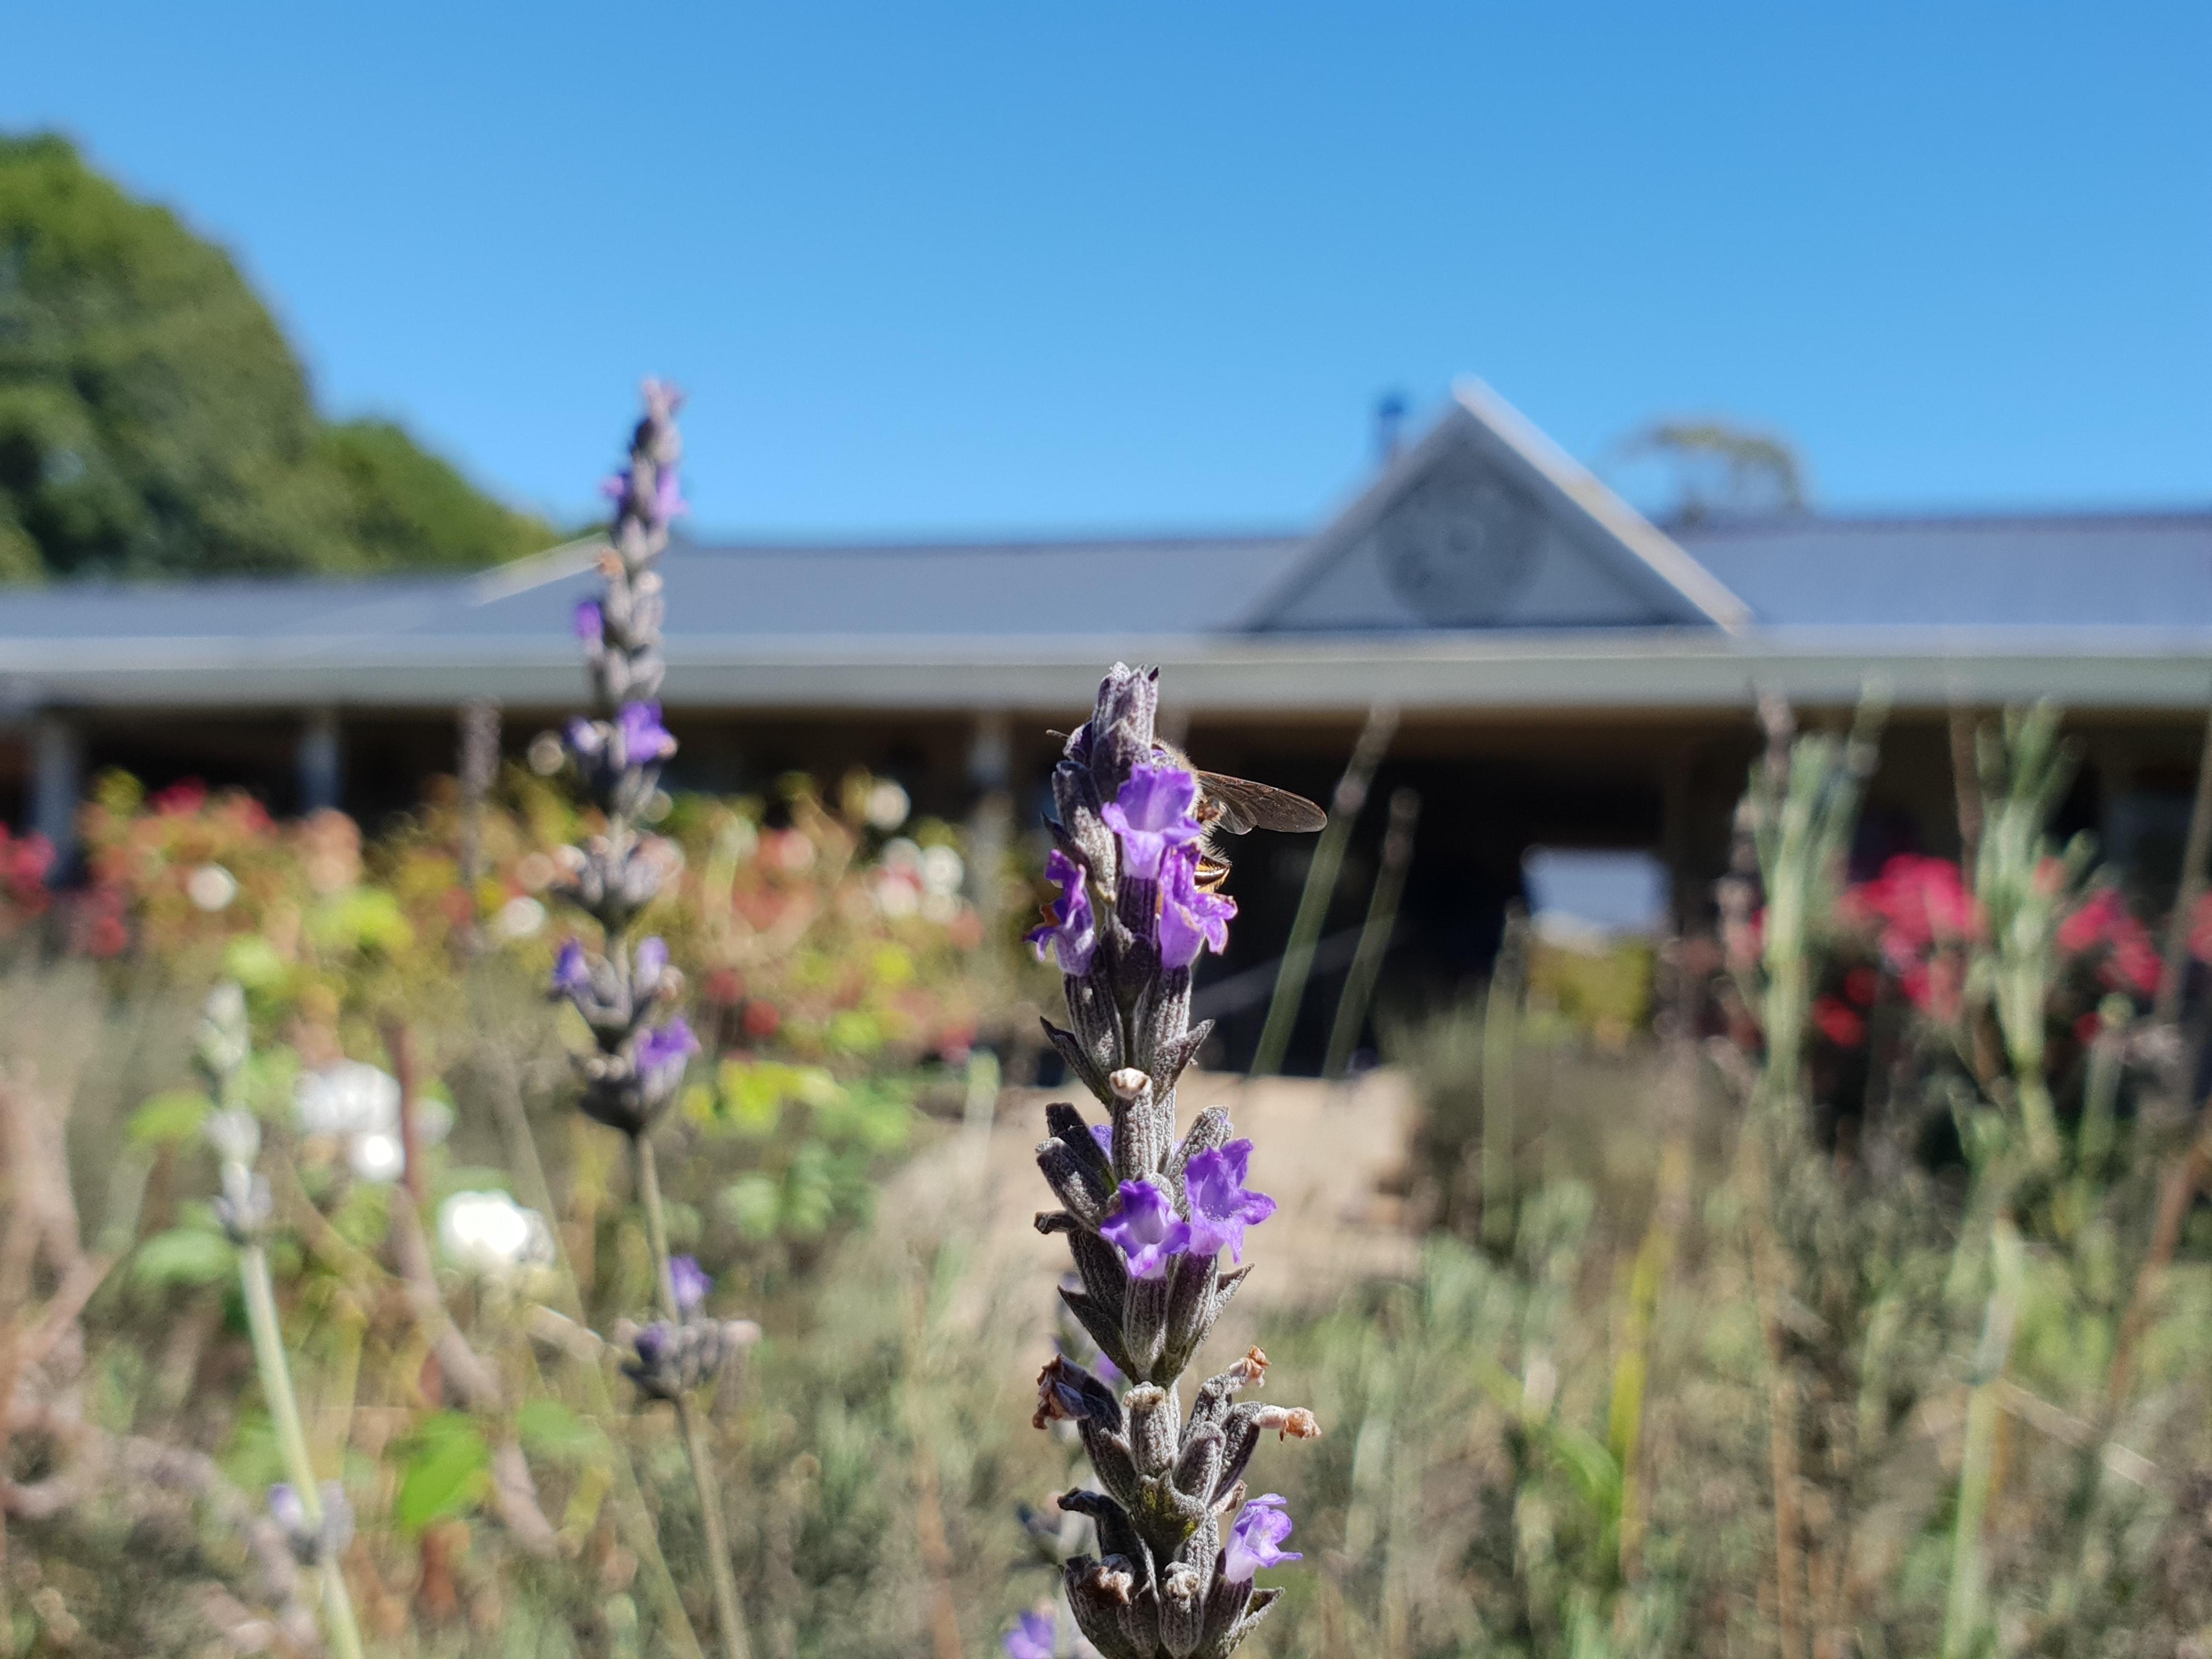 Purple flower in the garden, Purple flower in the garden